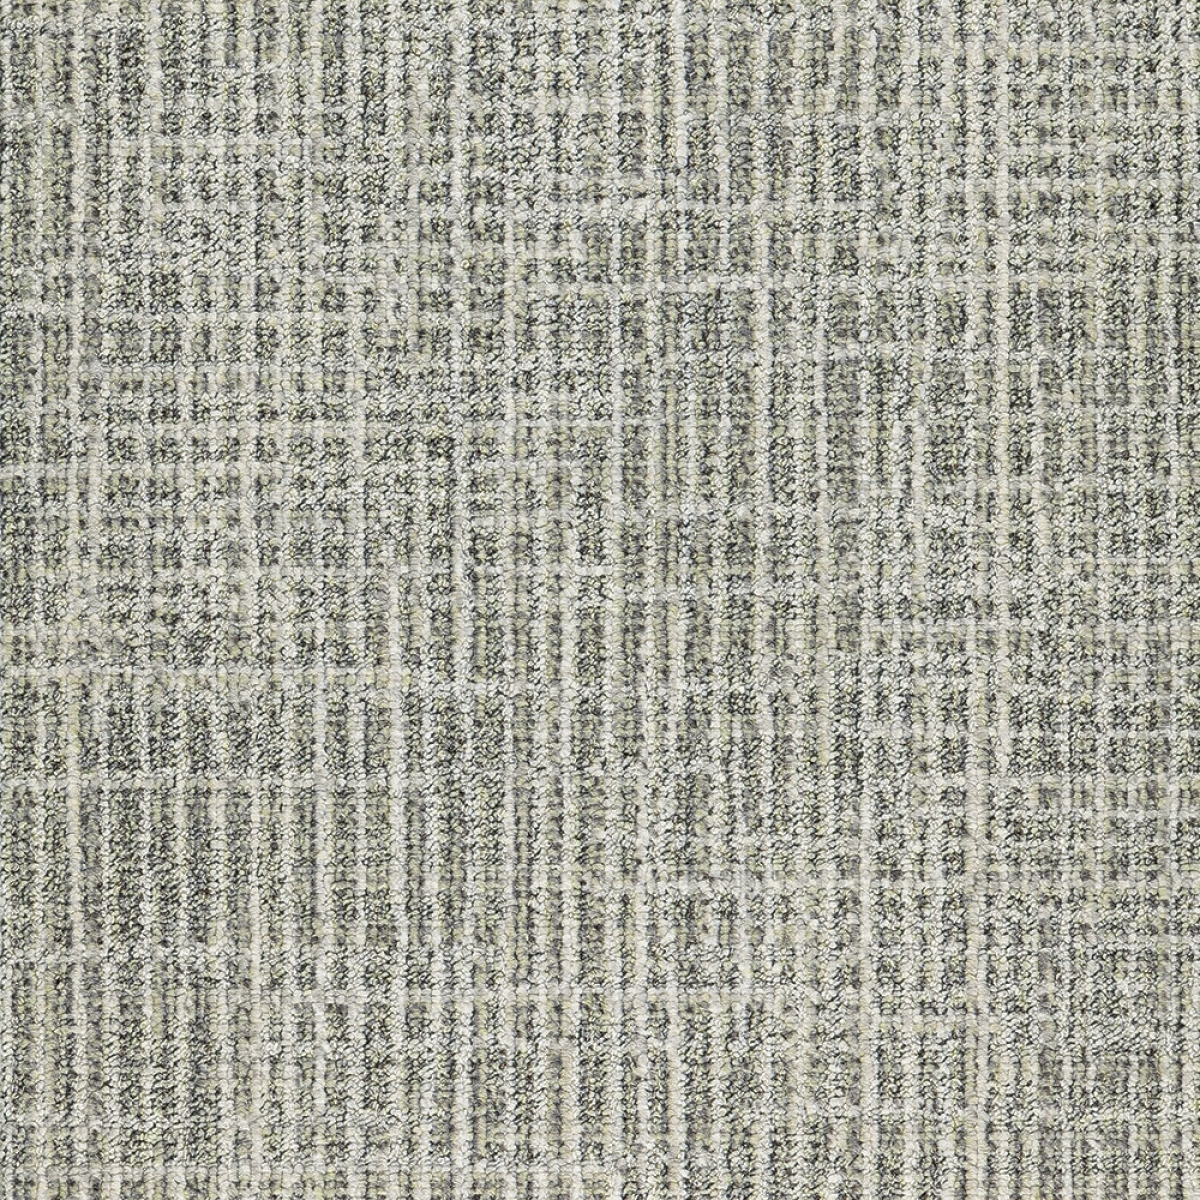 Katalog Kobercov 253 Ch čtverců Milliken Urban Collective